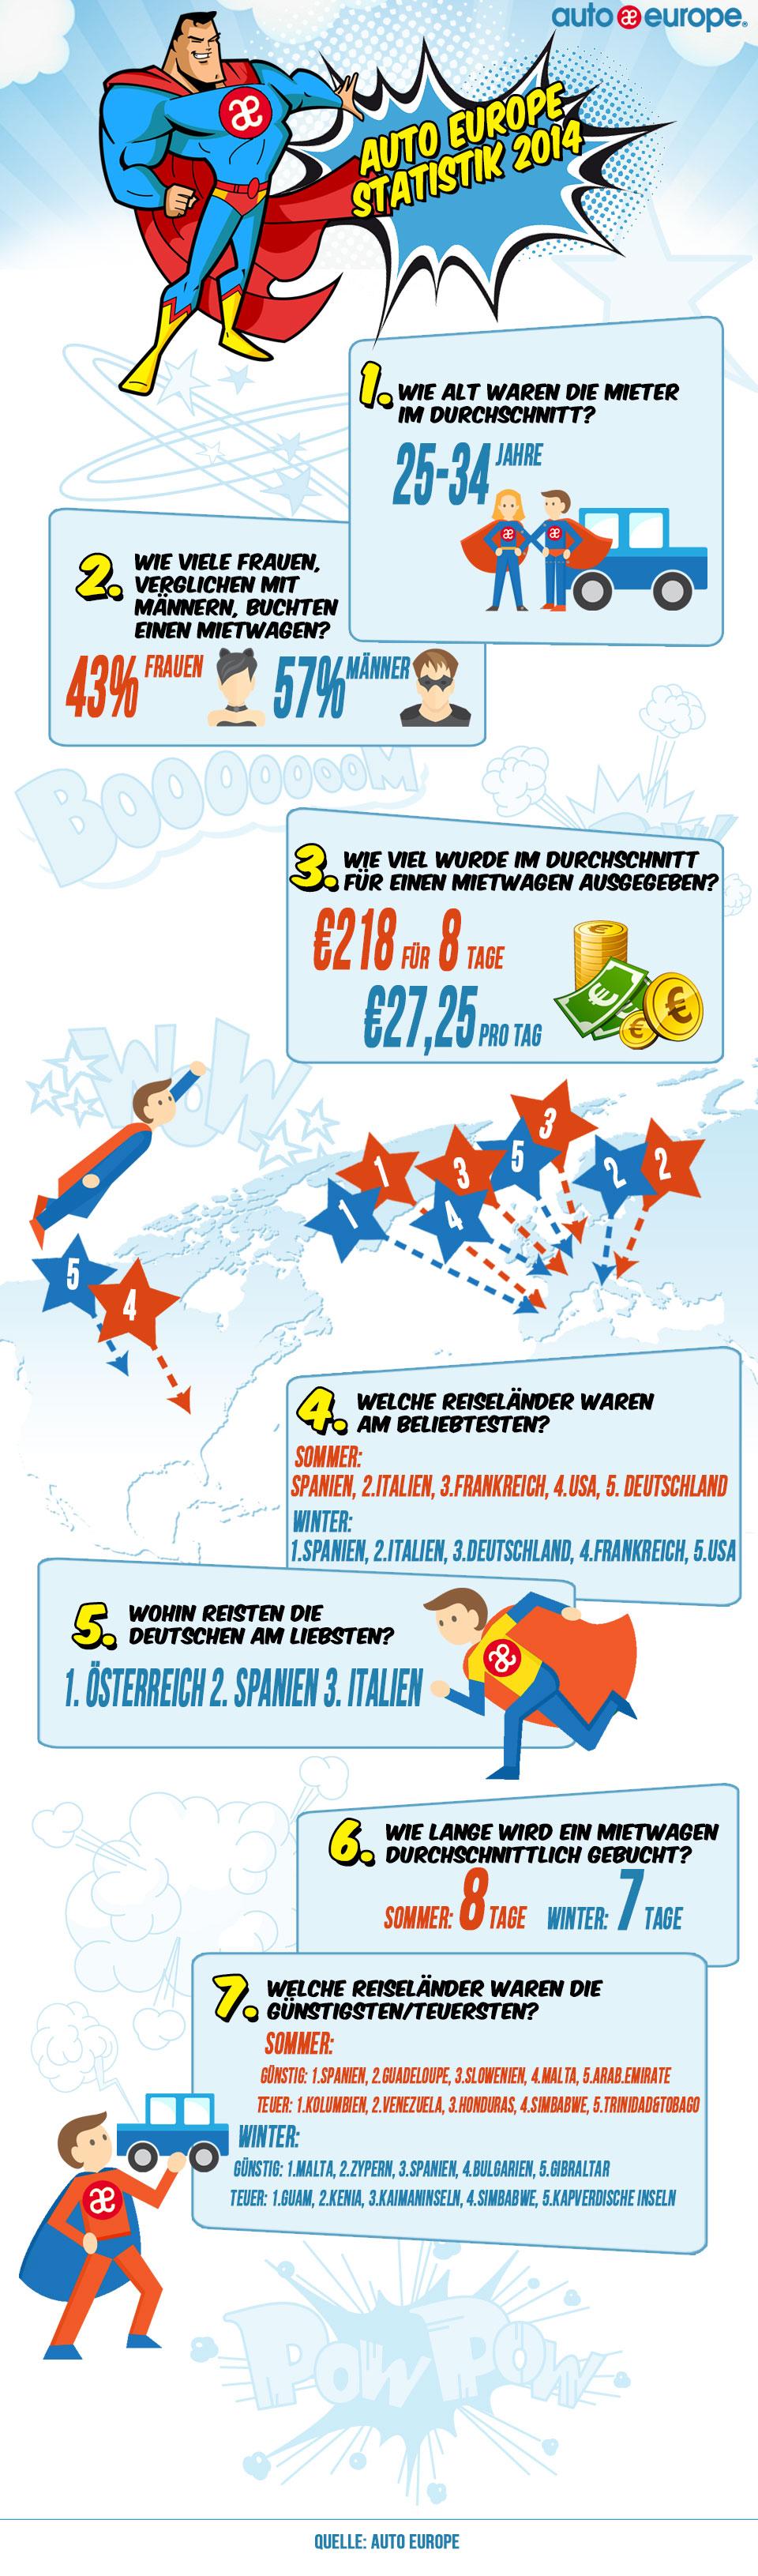 Auto Europe Statistiken 2014